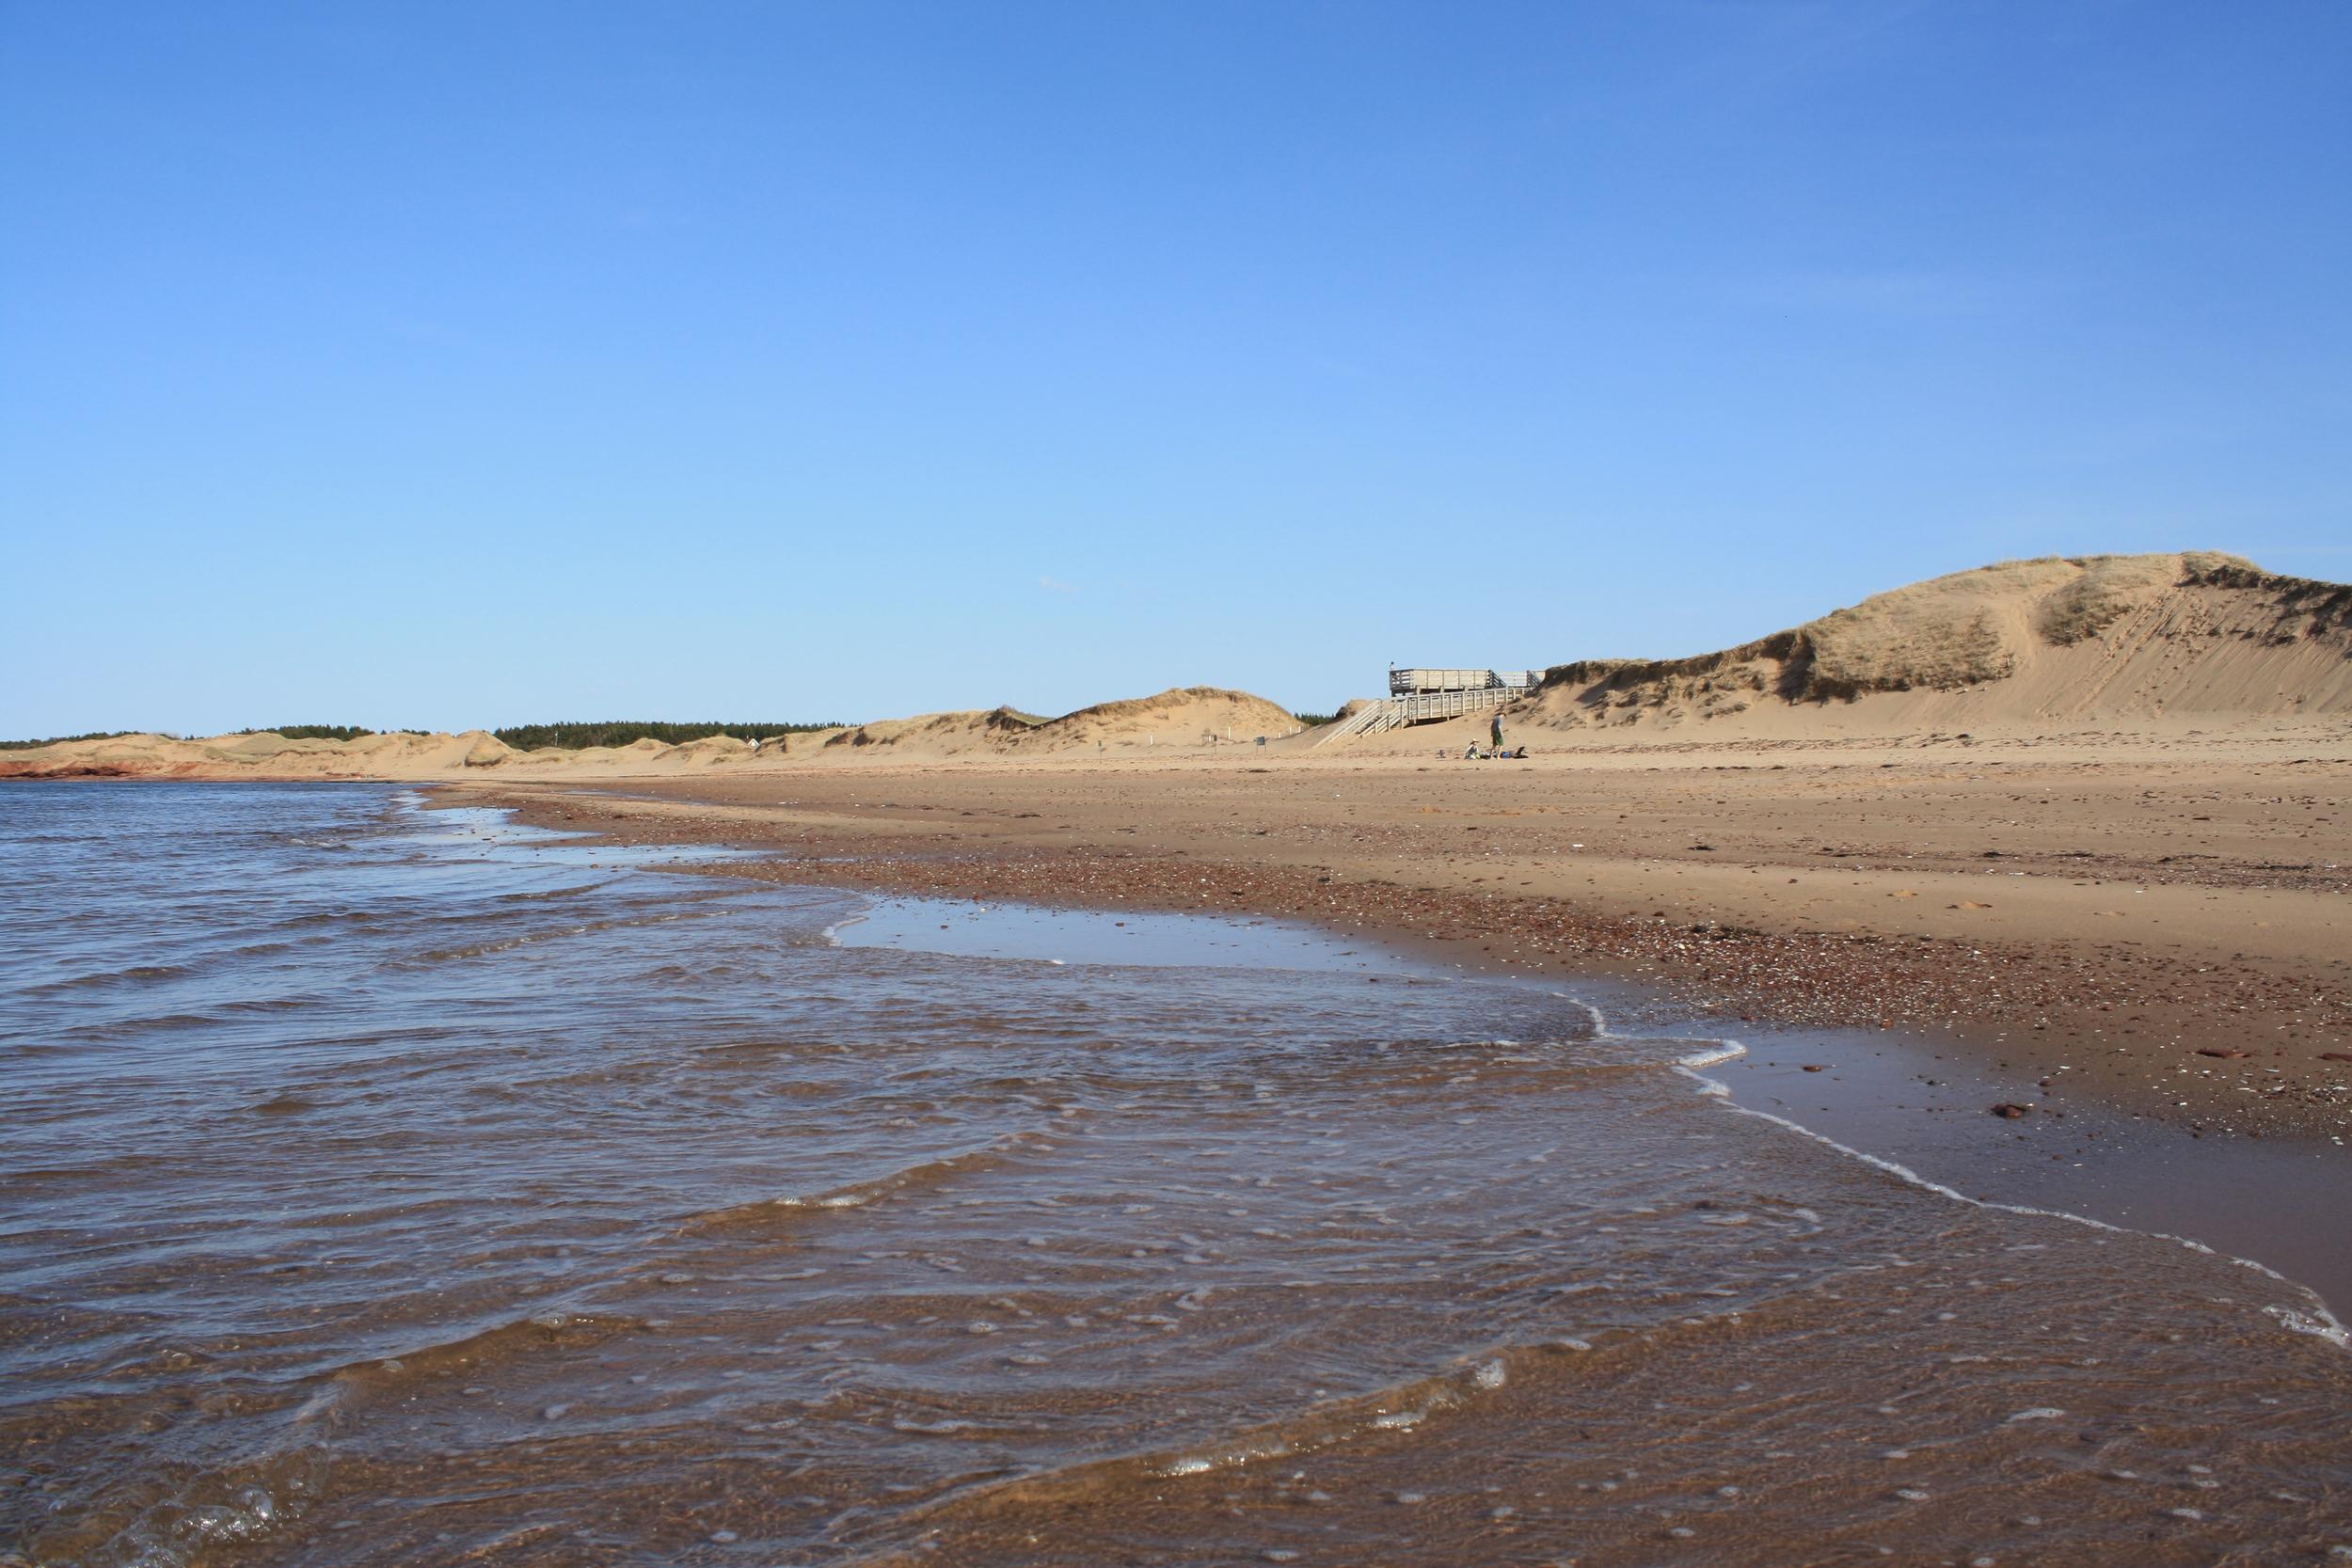 The Beach at Cavendish, North Shore, P.E.I.